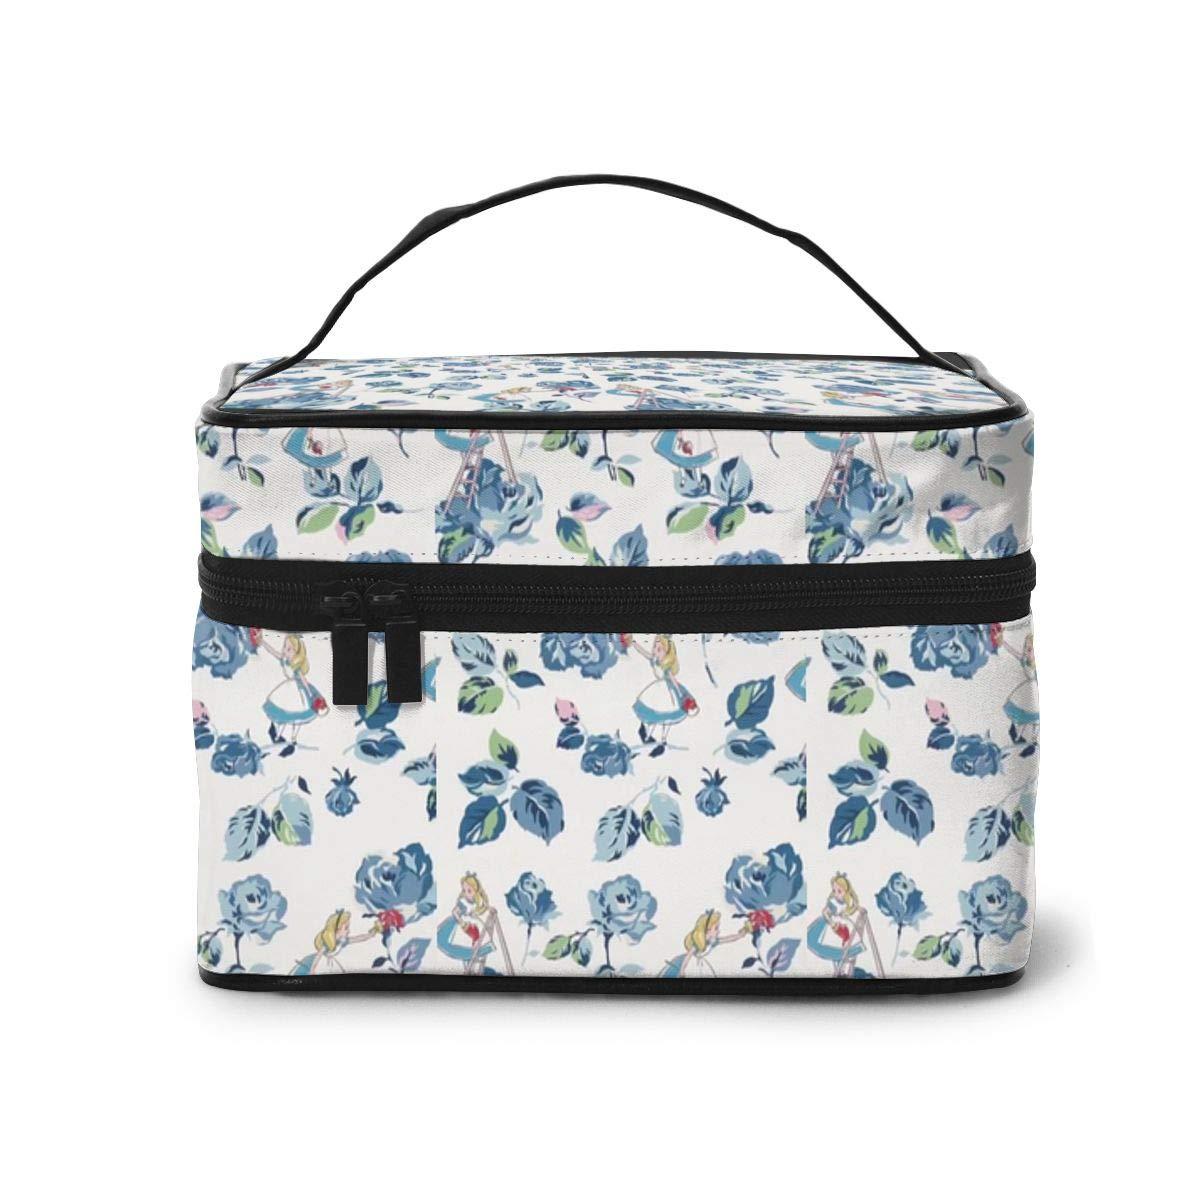 Makeup Bag, Alice Princess Travel Portable Cosmetic Bag Large Pouch Mesh Brush Organizer Toiletry Bag for Women Girls